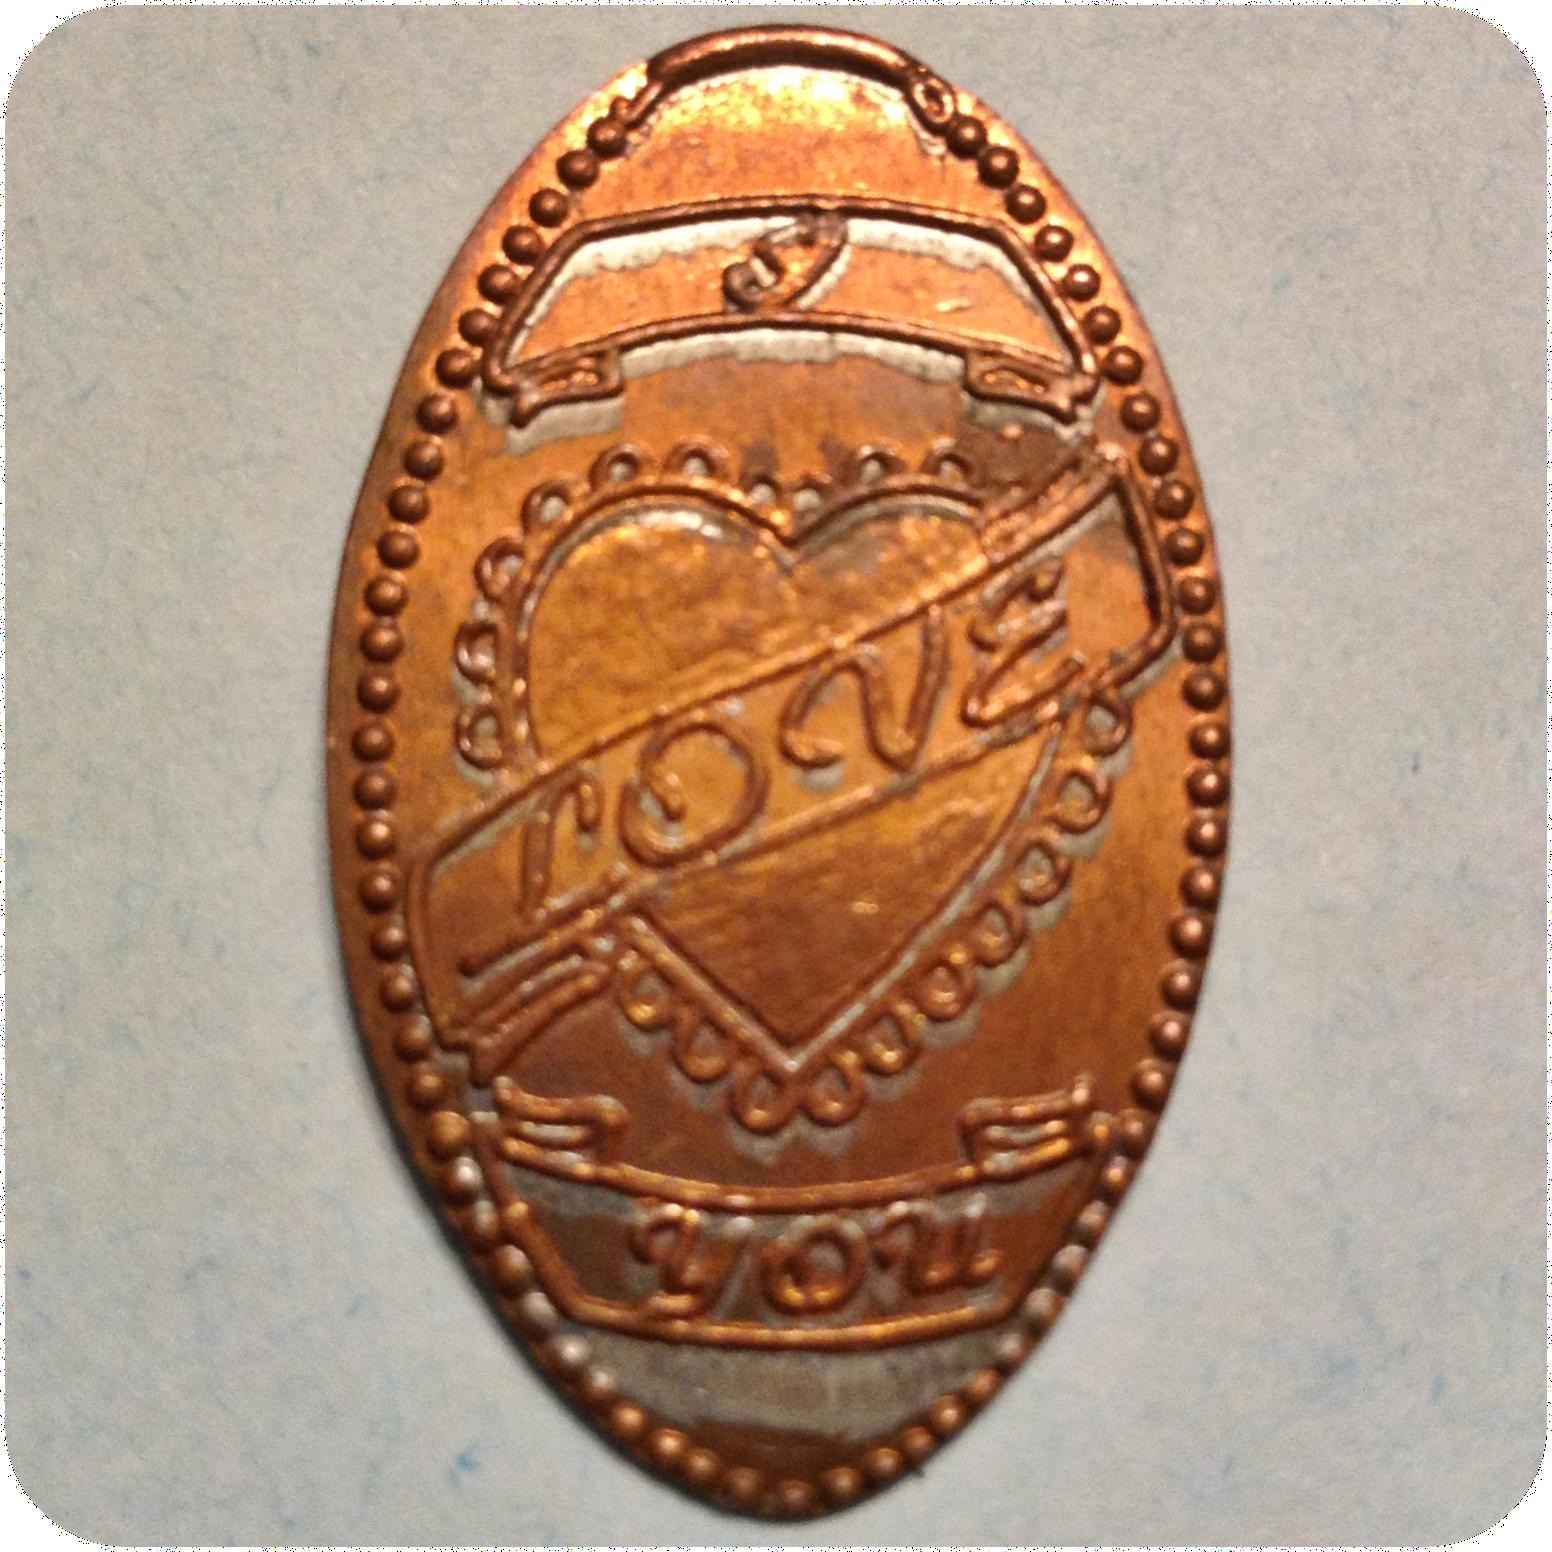 I Love You With Heart And Ribbons, Discovery Center of Idaho, Boise, ID Idaho EC